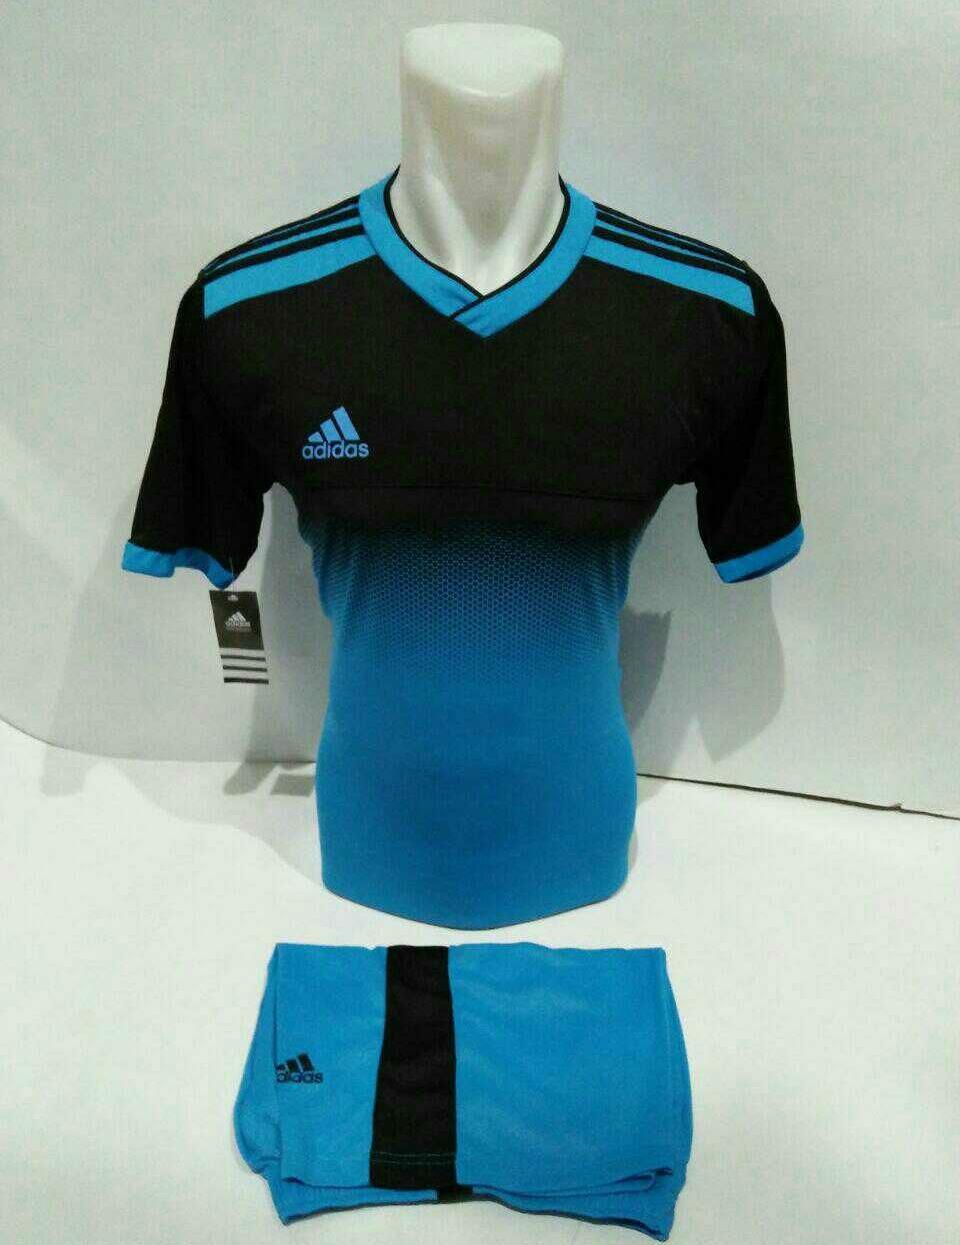 Baju kaos jersey bola setelan futsal bola/volly Adidas 04 Hitam biru